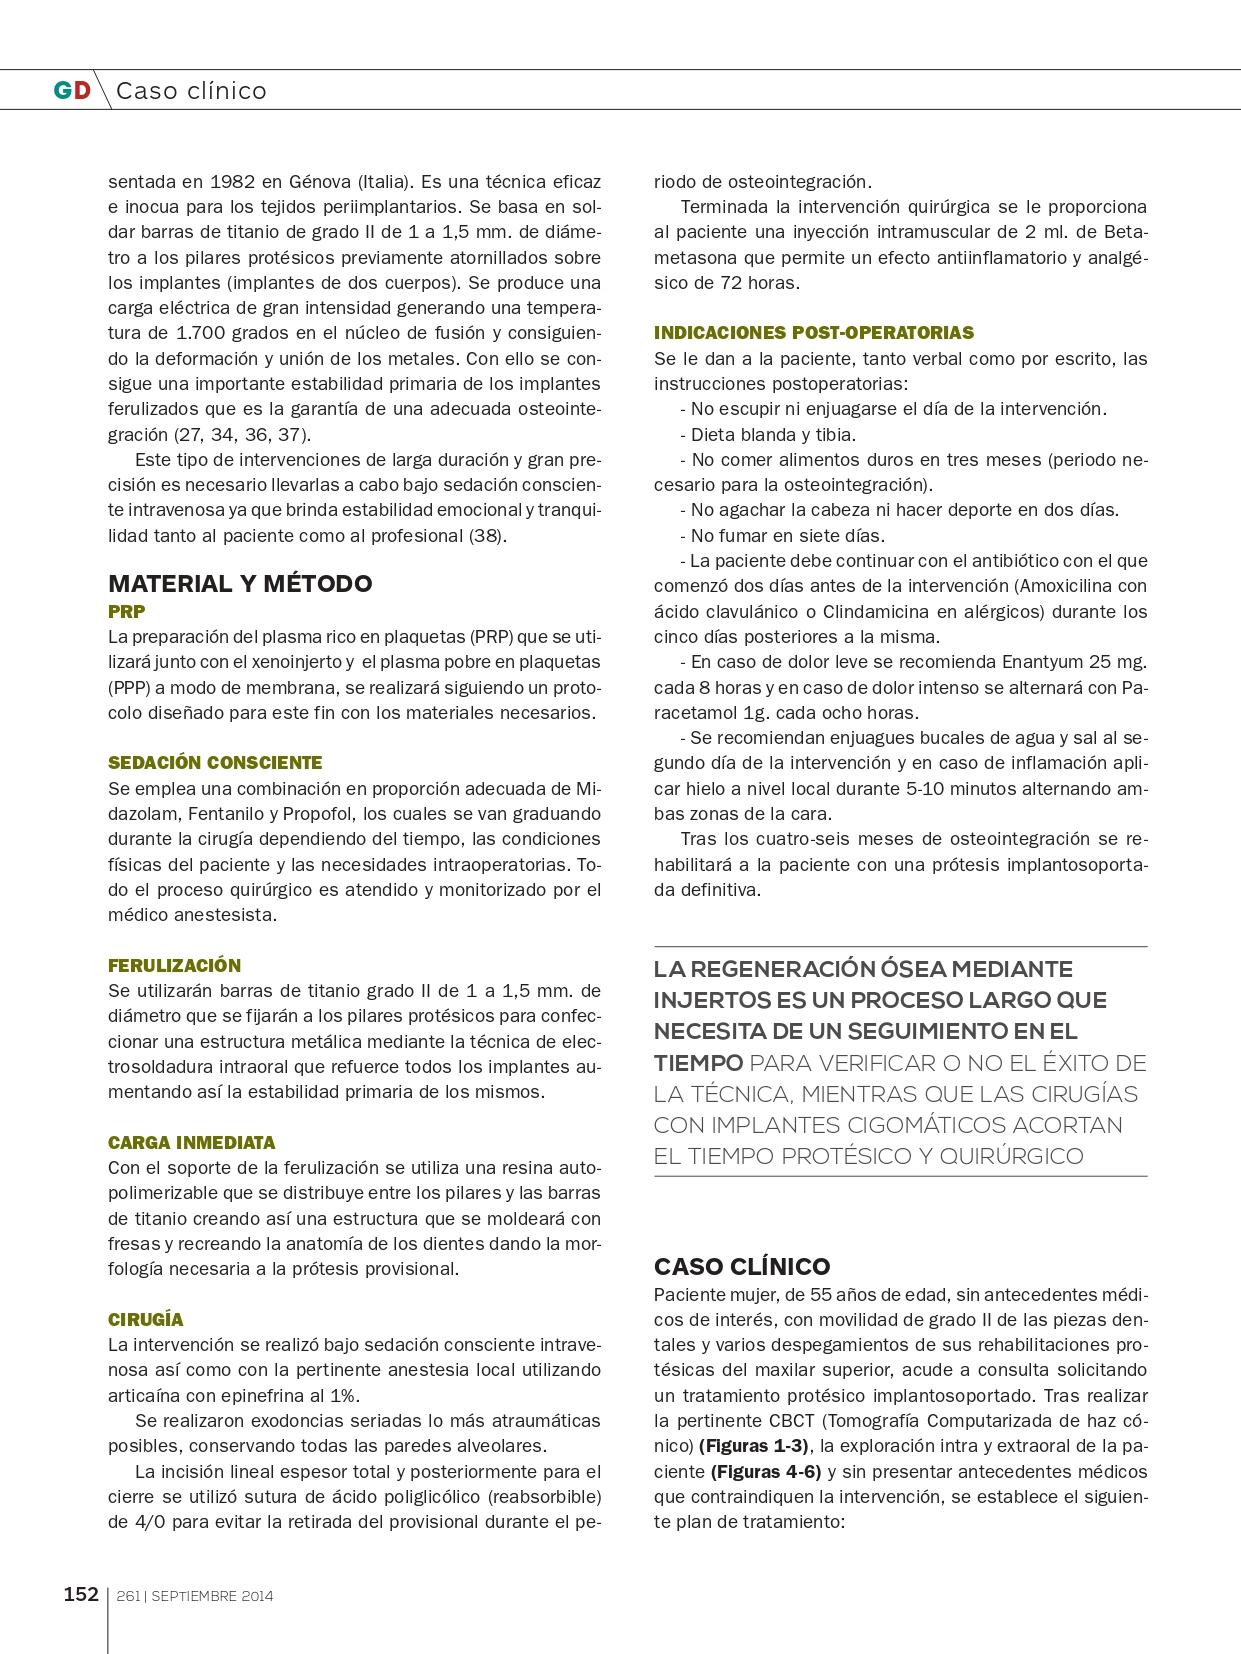 Rehabilitación-del-Maxilar-superior-con-implantes-Cigomáticos_page-0003